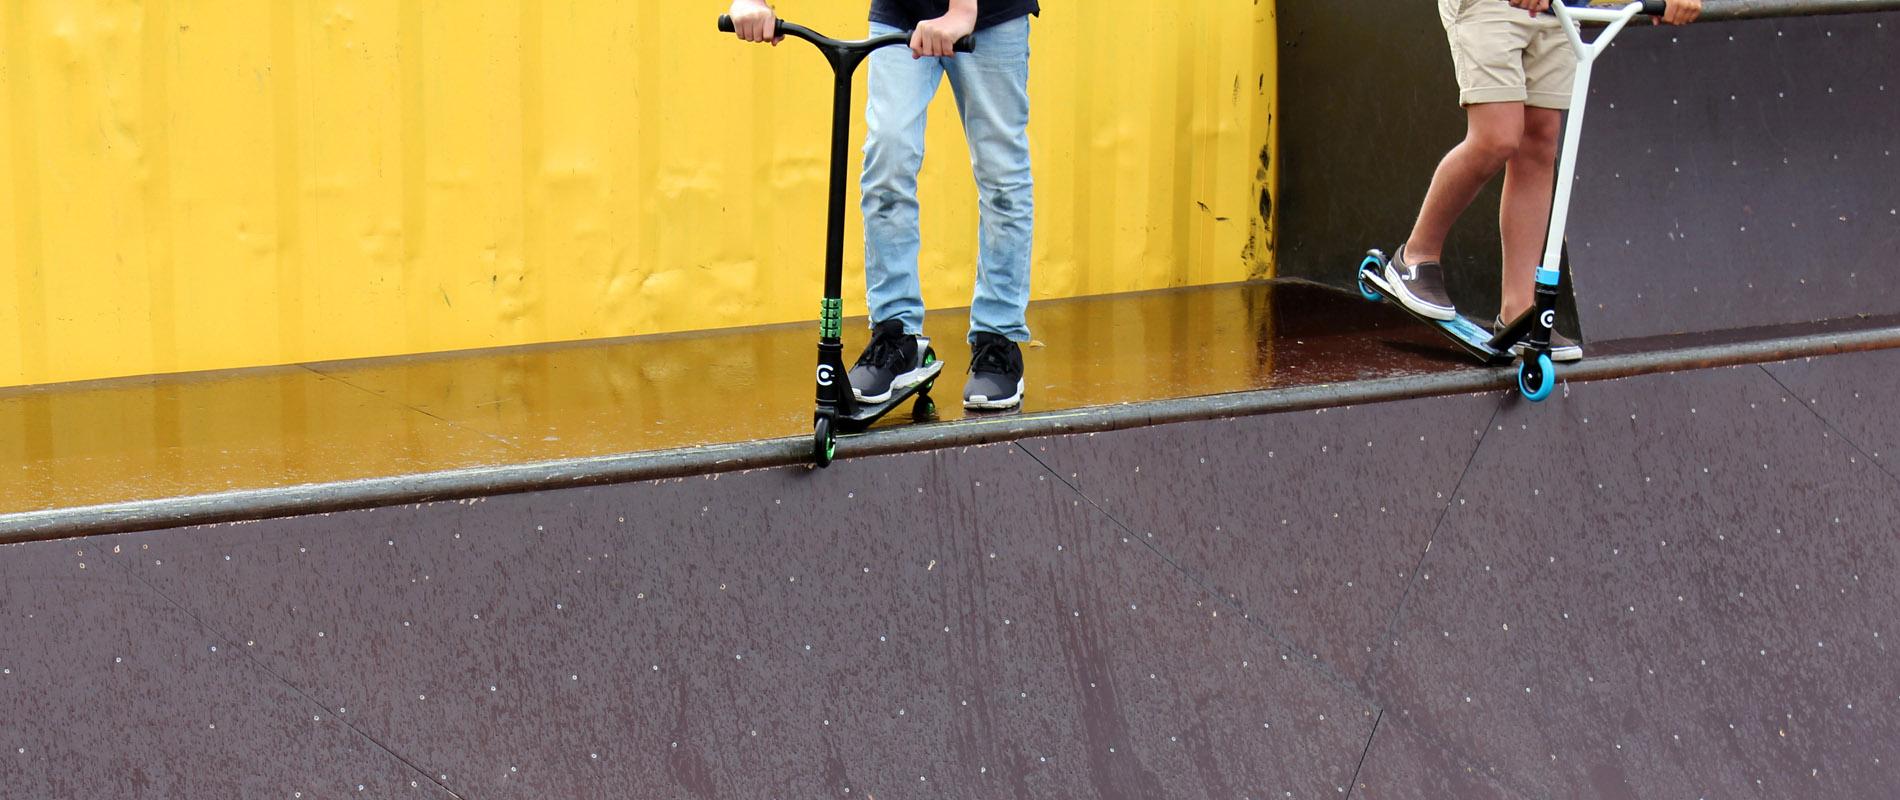 Kick bikes on a trick arena